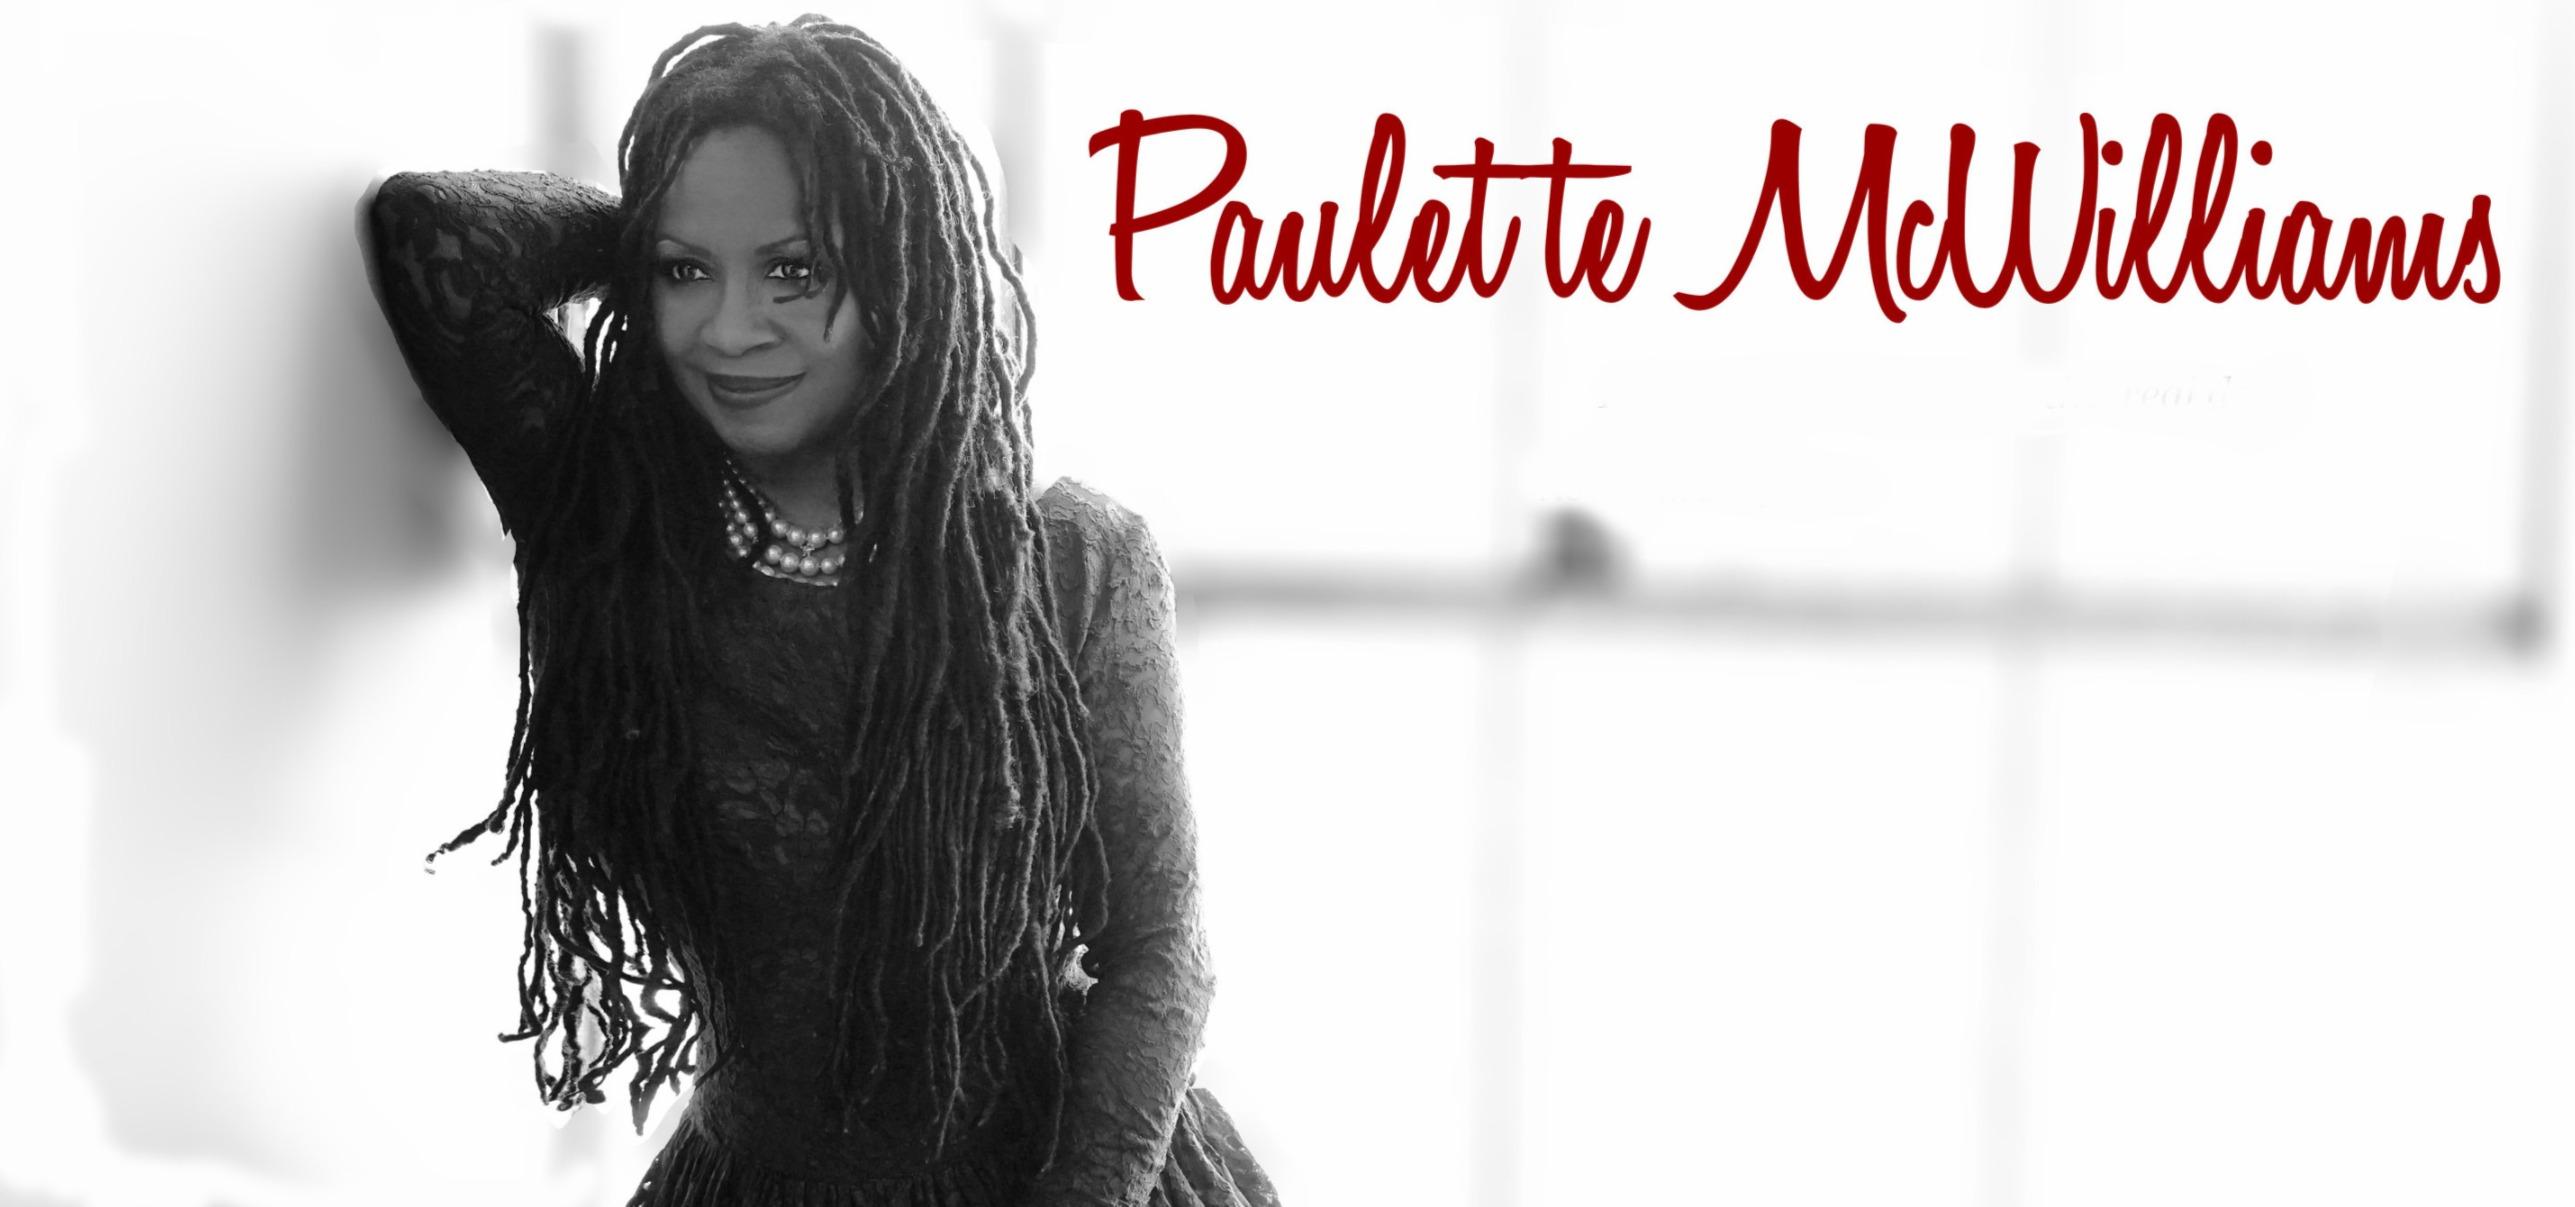 'Paulette%20McWilliams%20I%20Official%20